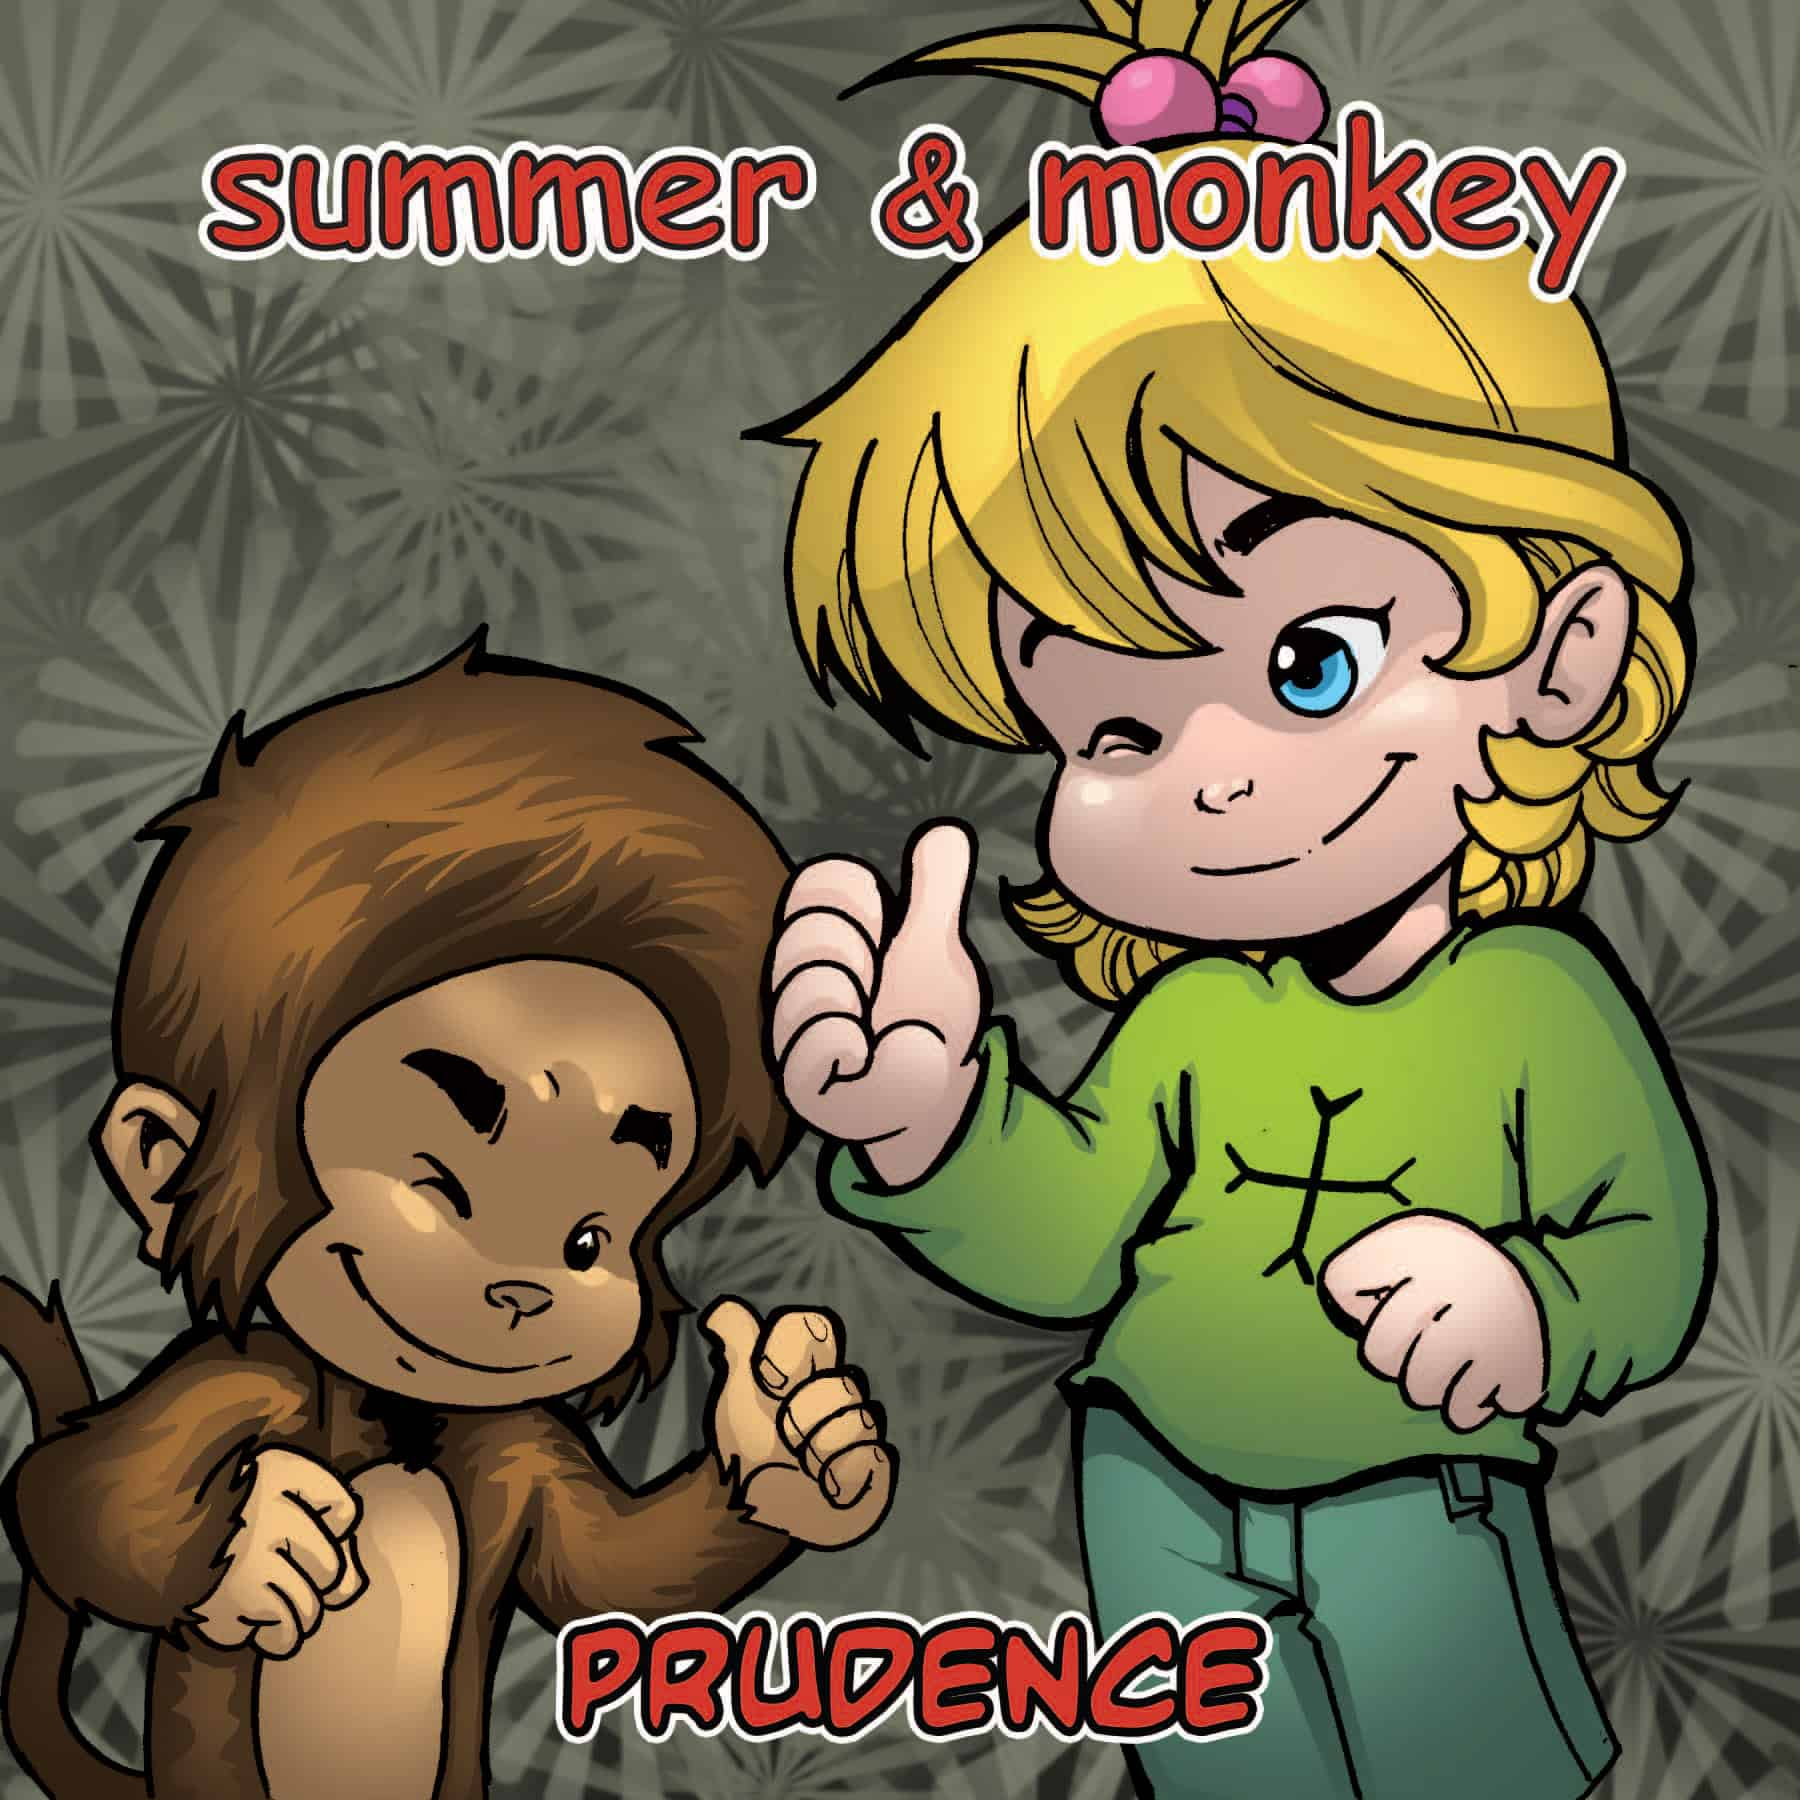 Summer_Prudence-300dpi-1